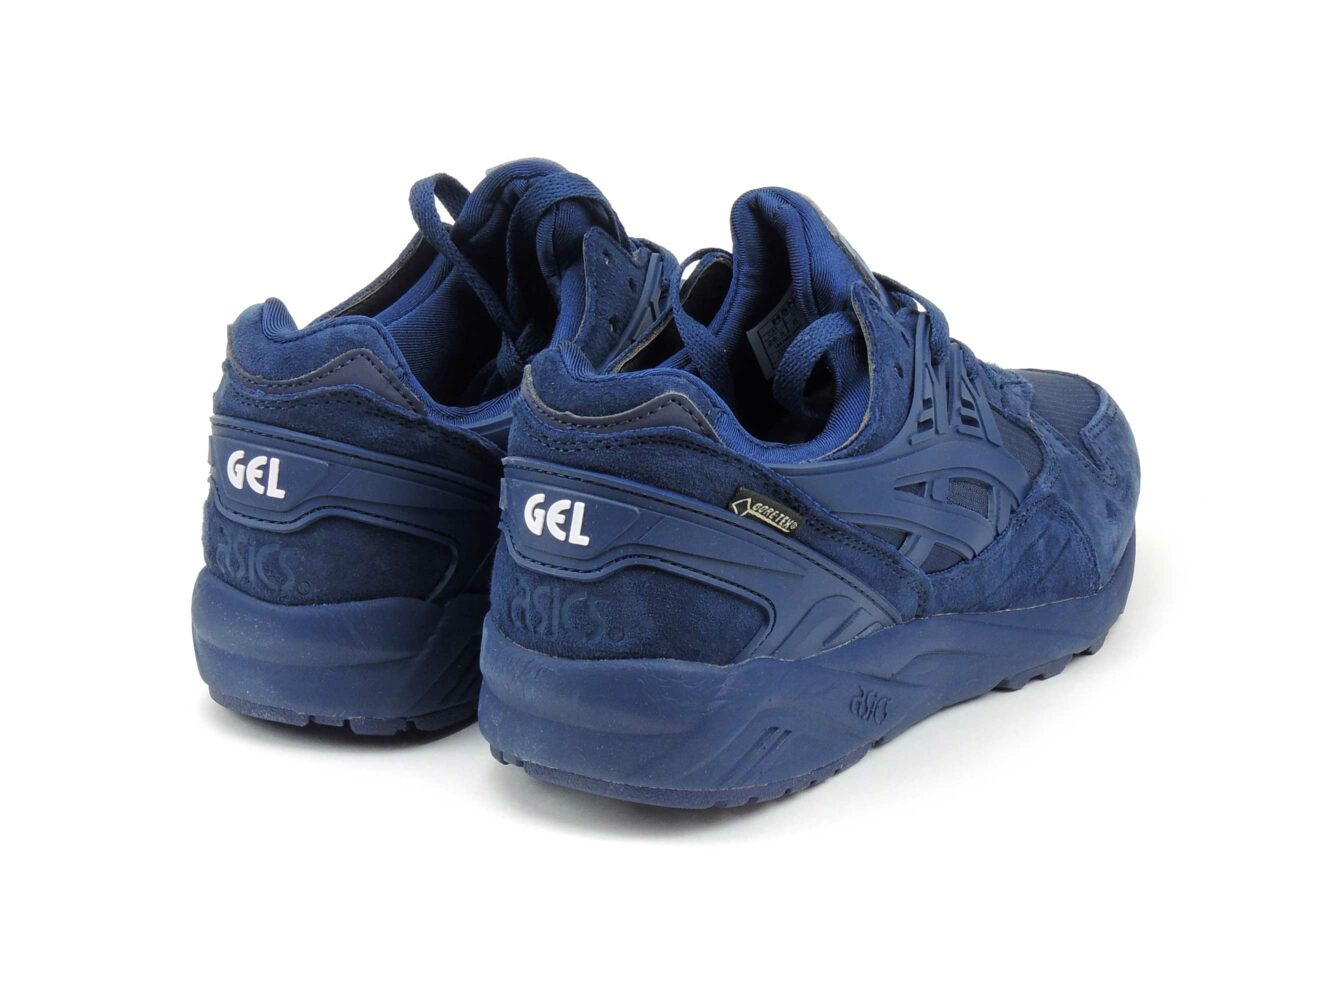 ASICS GEL KAYANO TRAINER DARK BLUE H5N4L-5050 интернет магазин